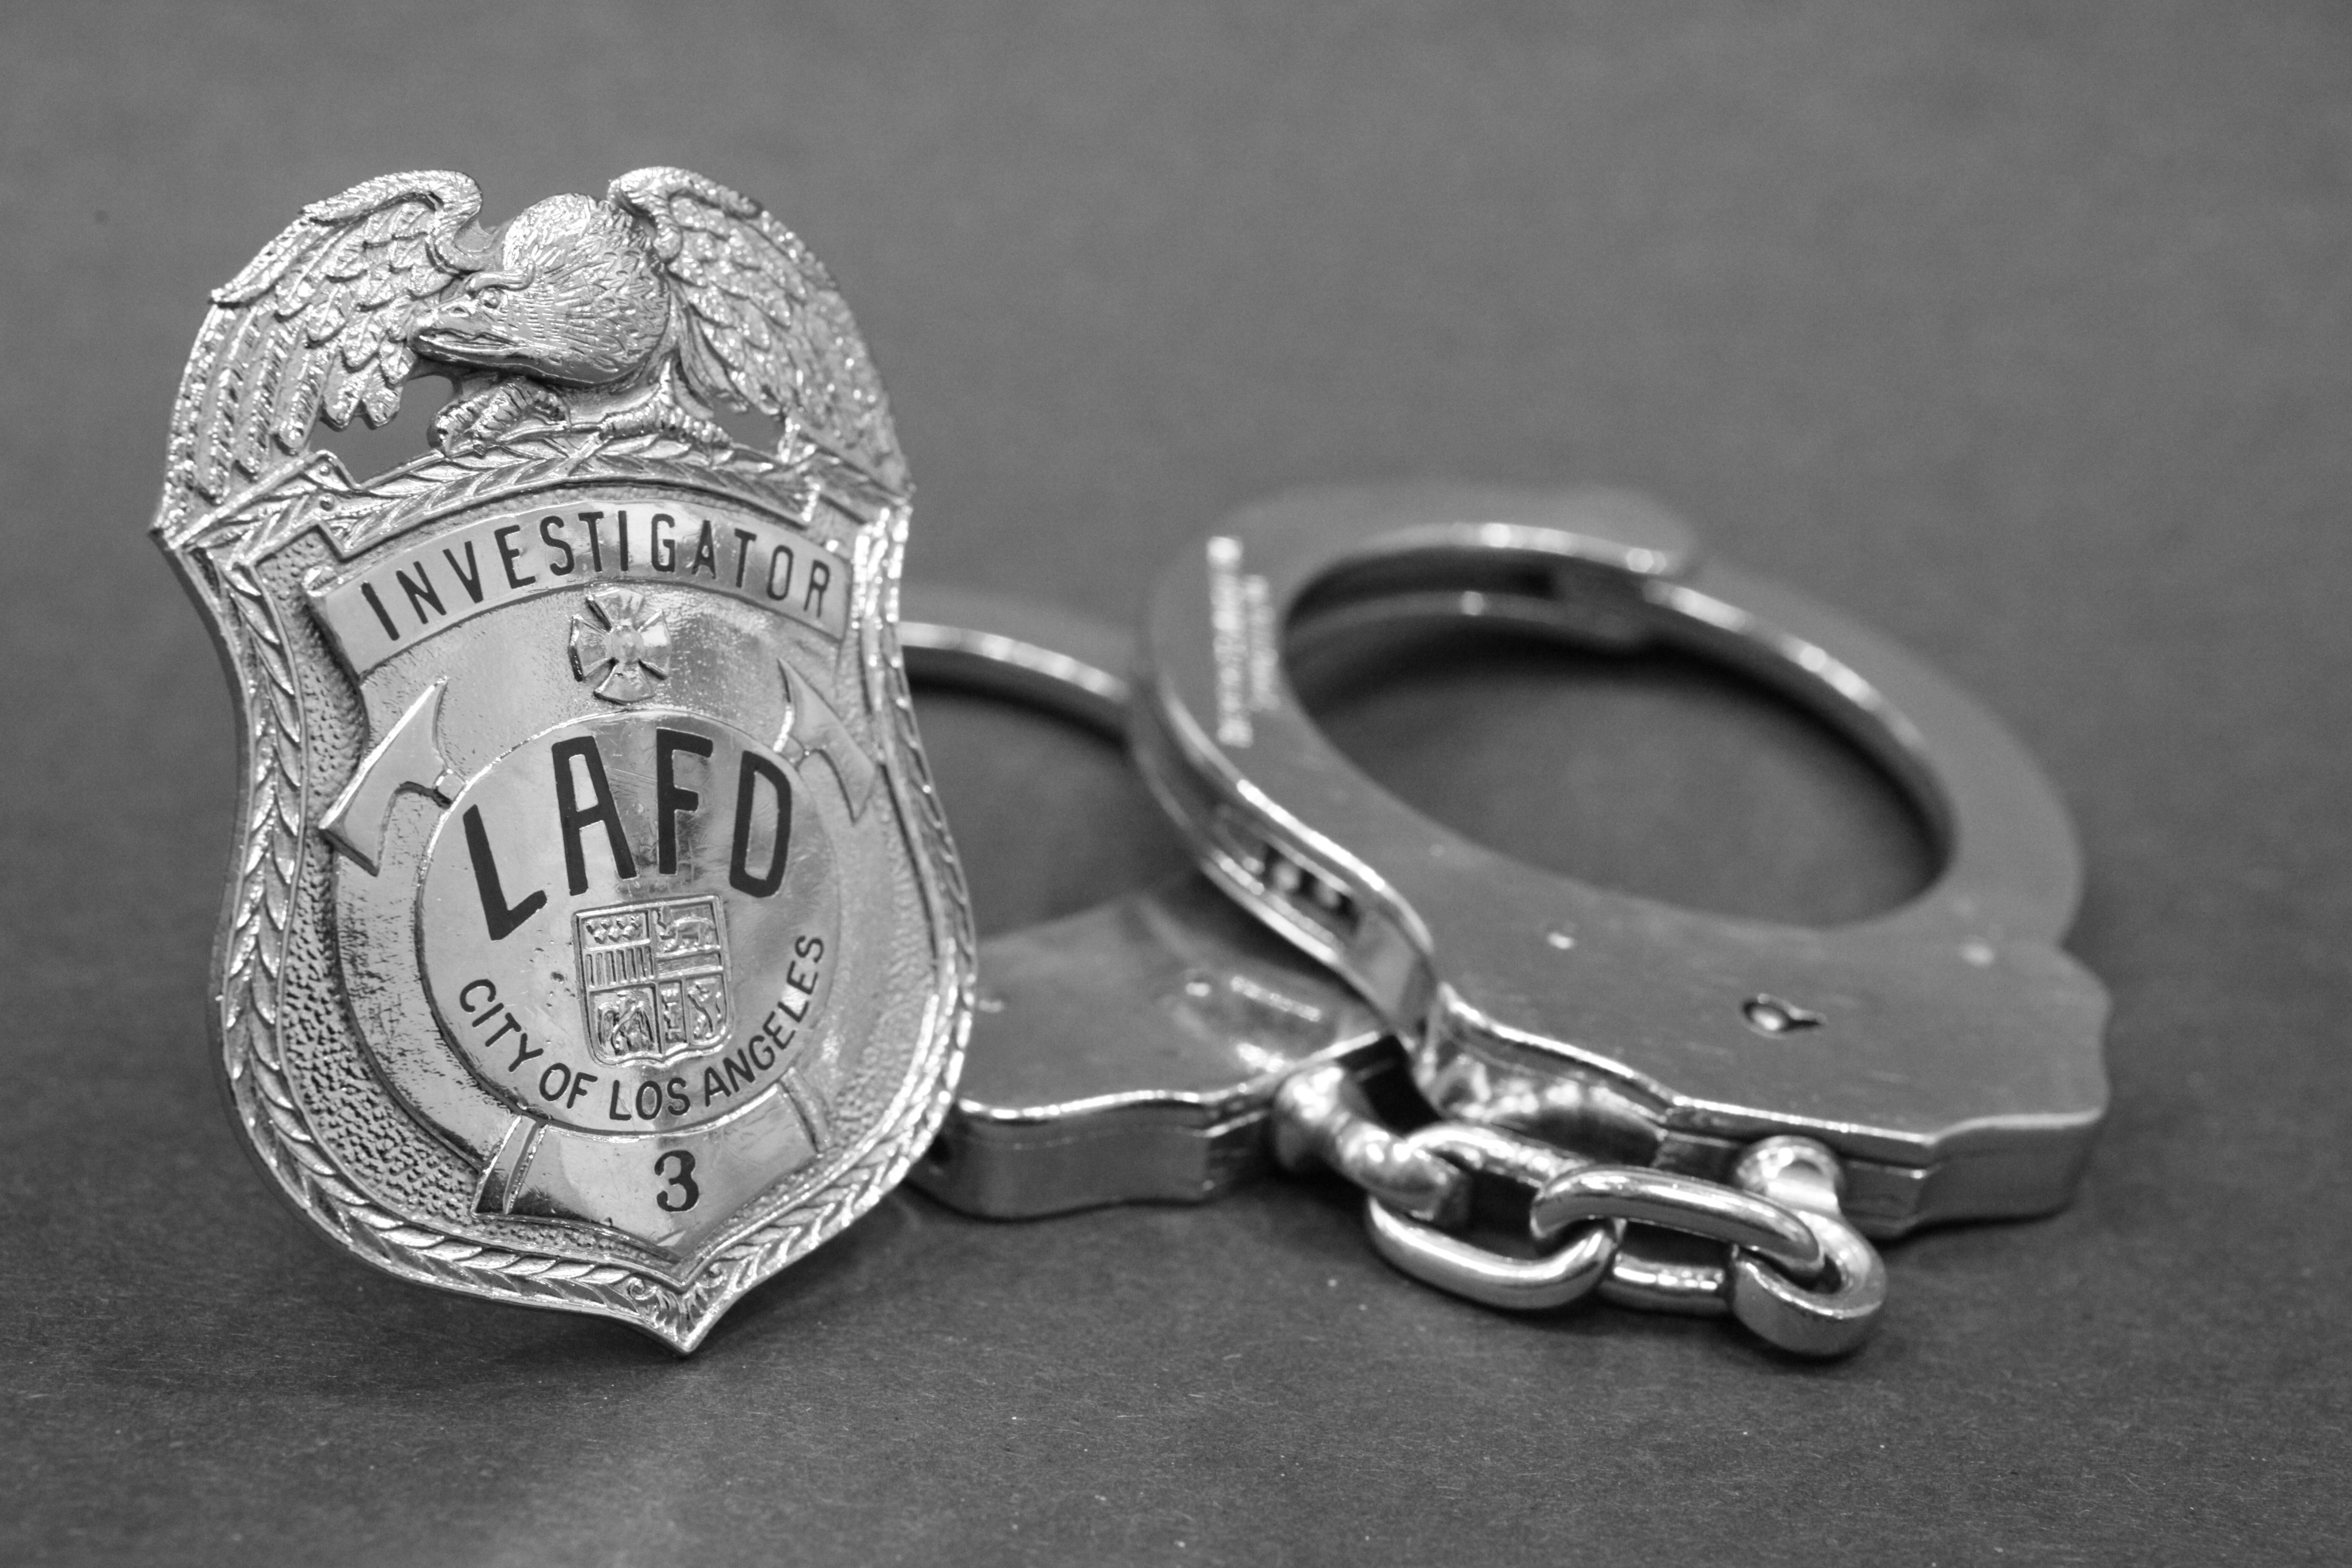 Arson Badge and handcuffs